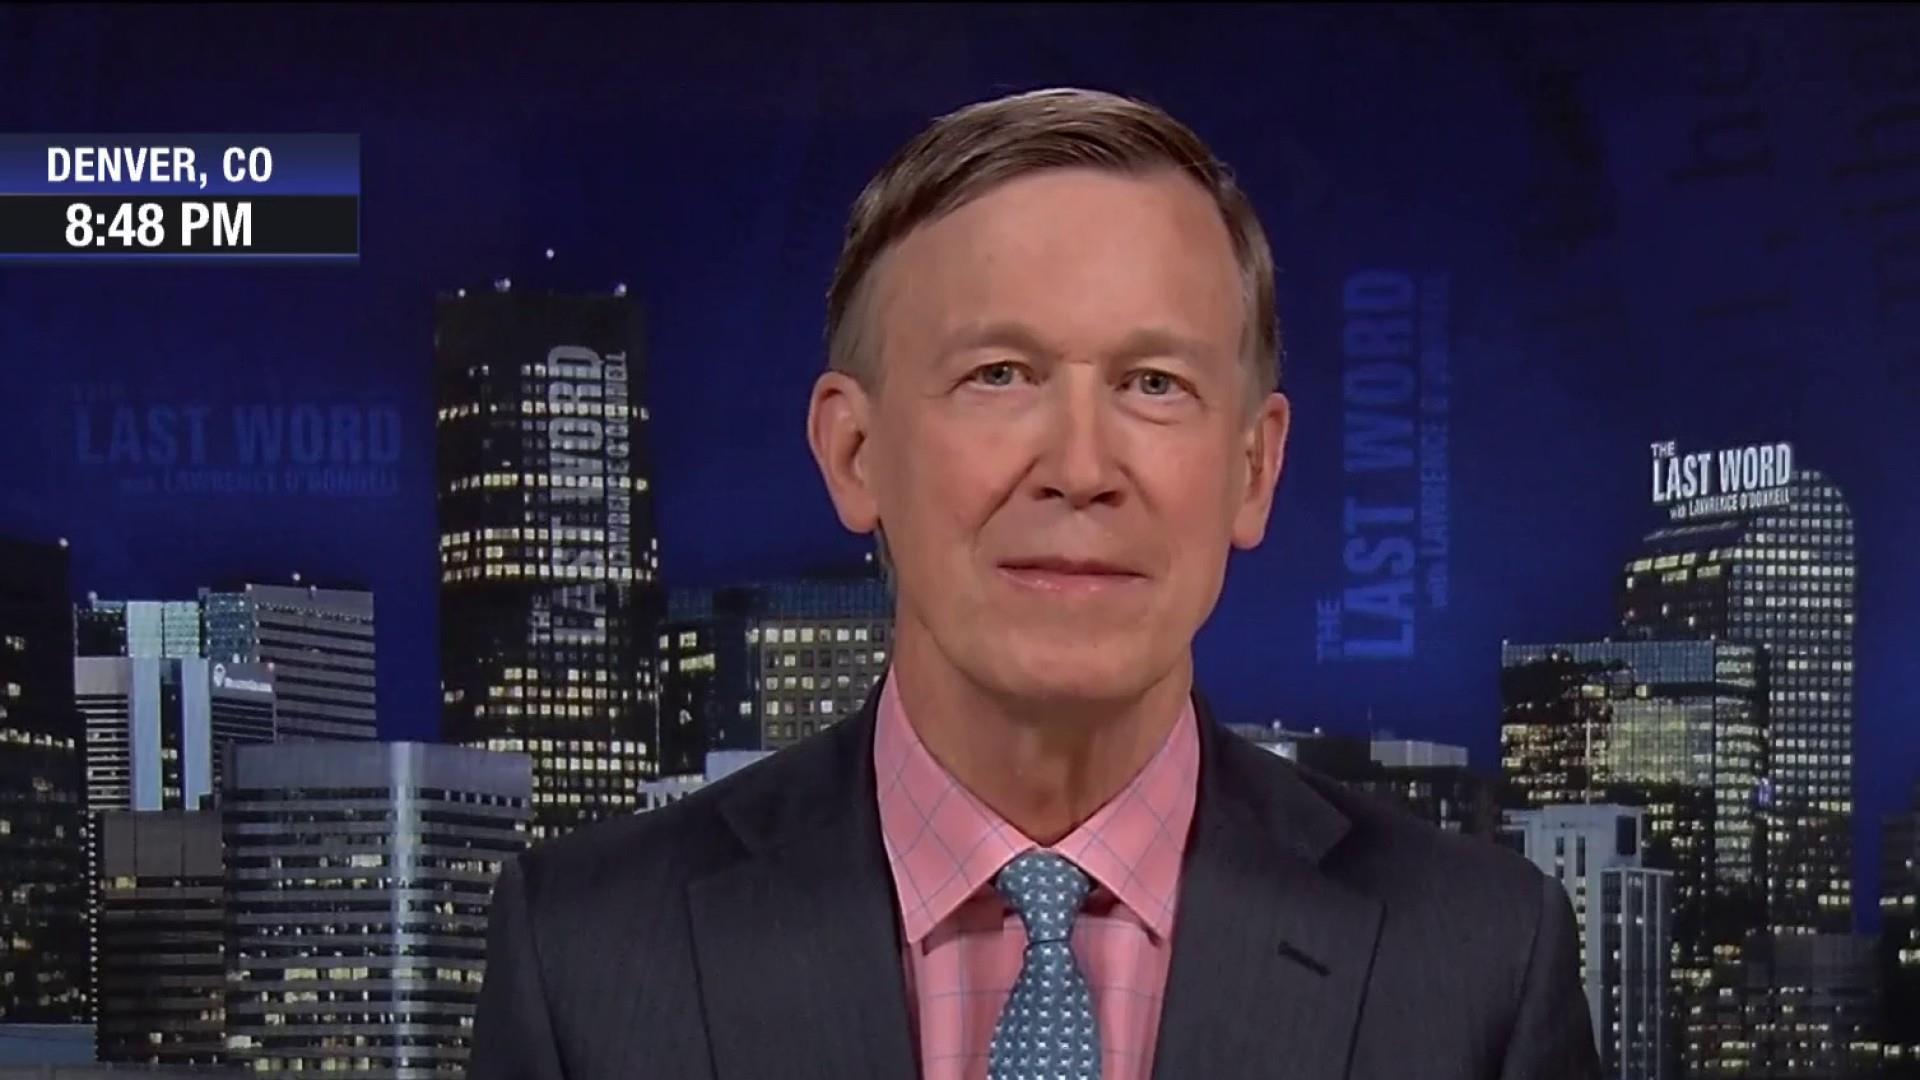 Lawrence interviews presidential contender John Hickenlooper